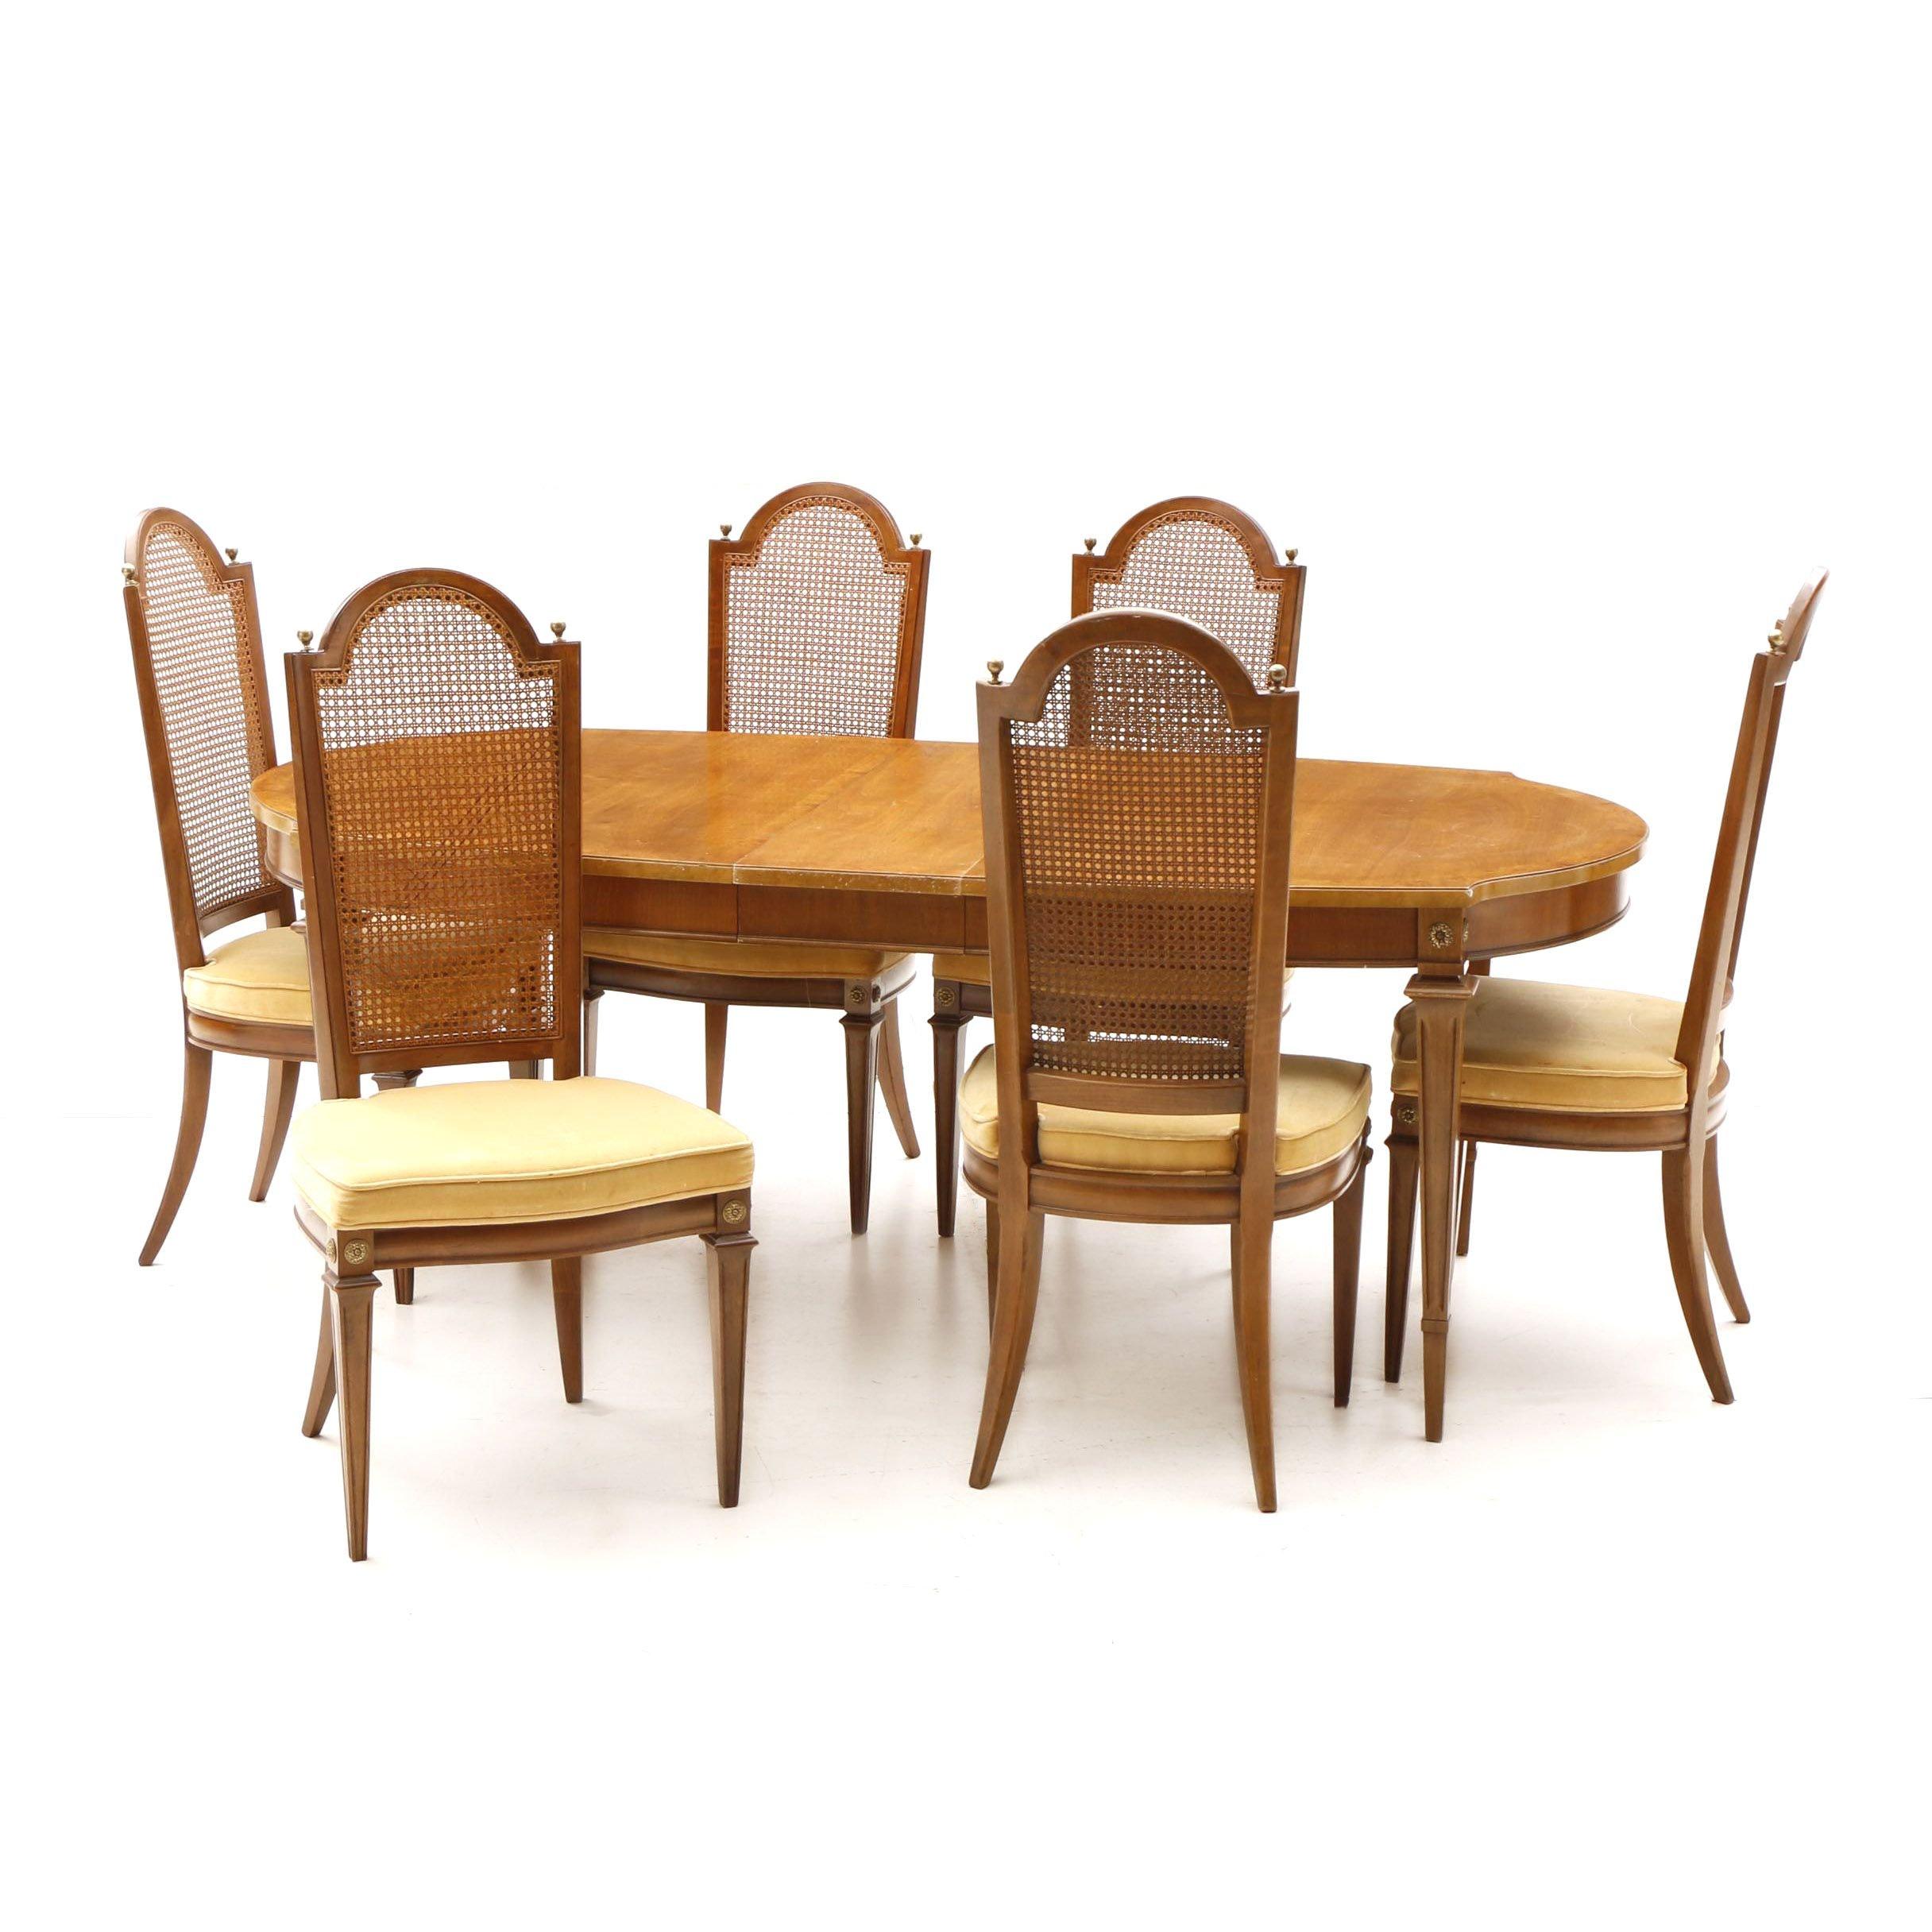 Mediterranean Style Pecan Dining Set by Thomasville Furniture, 20th Century